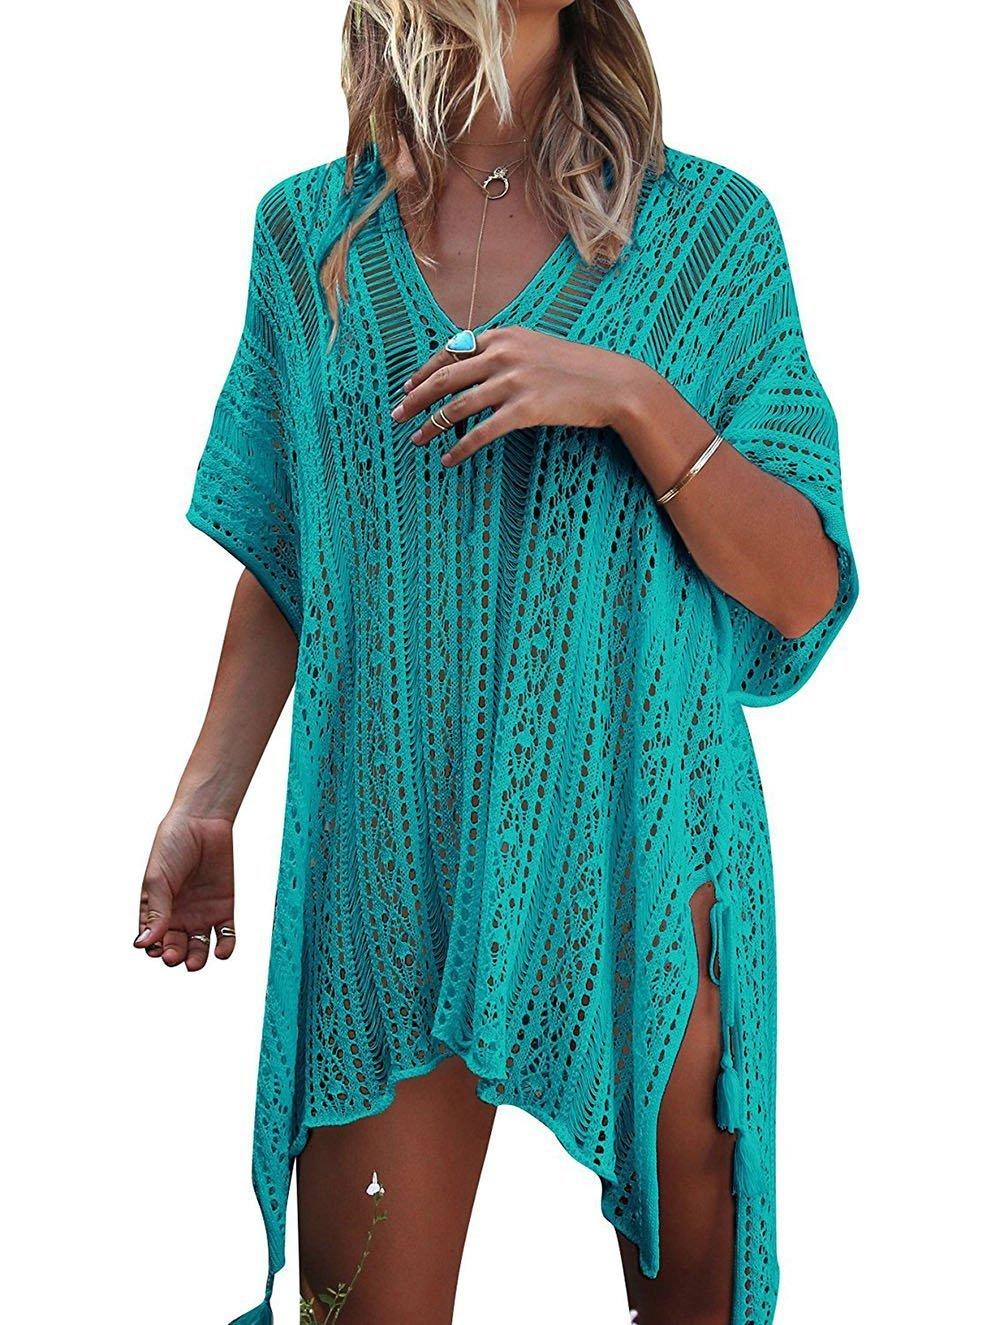 Garsumiss Women Beach Swimsuit Crochet Cover up Beach Bikini Dress Stylish Bathing Suit